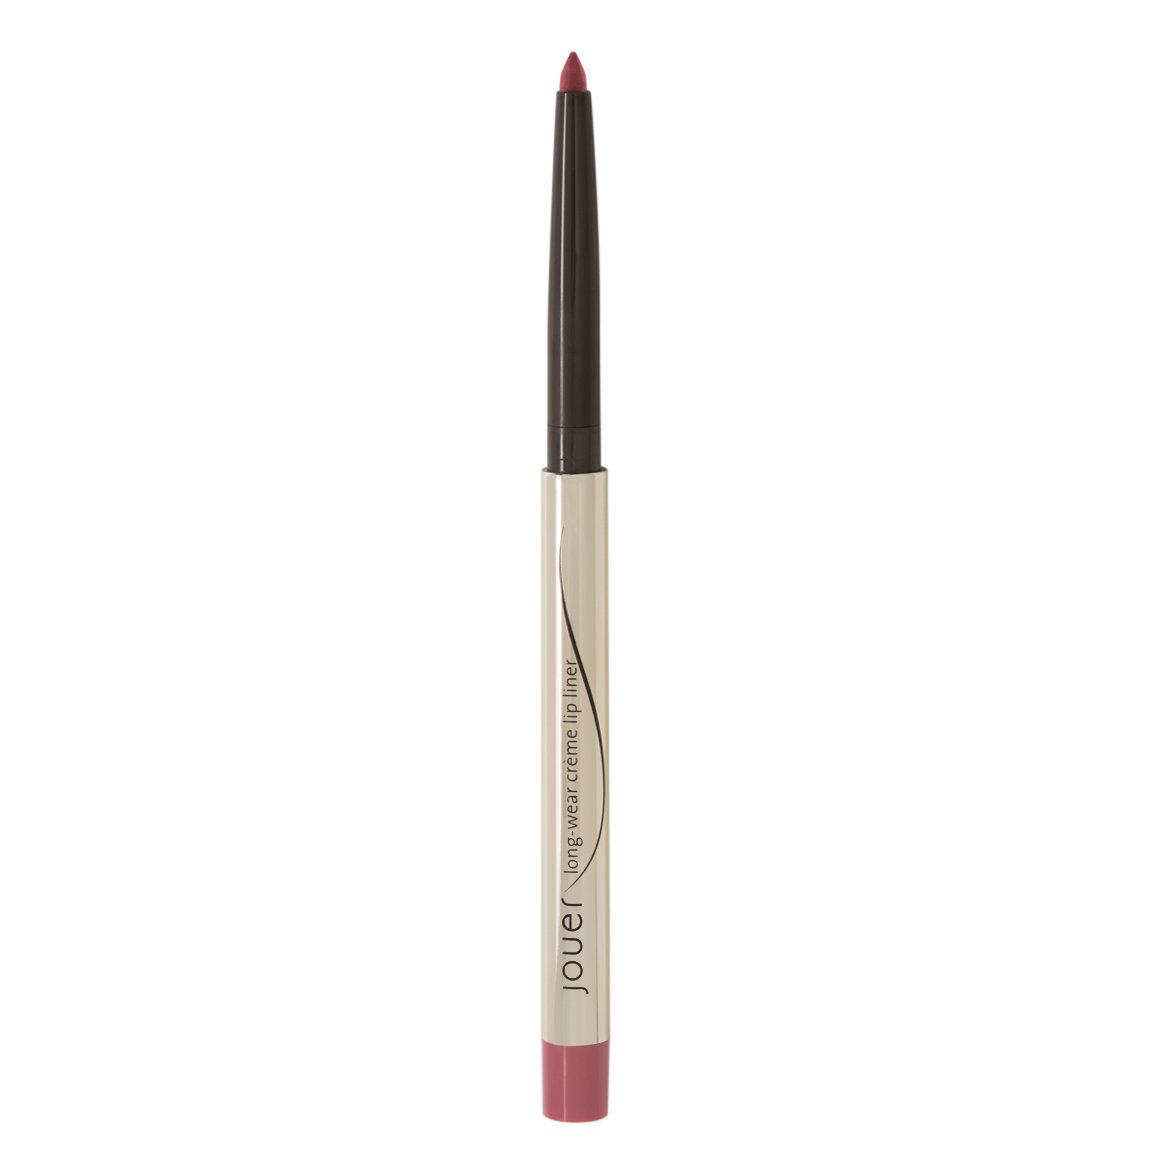 Jouer Cosmetics Long-Wear Crème Lip-Liner Tawny Rose